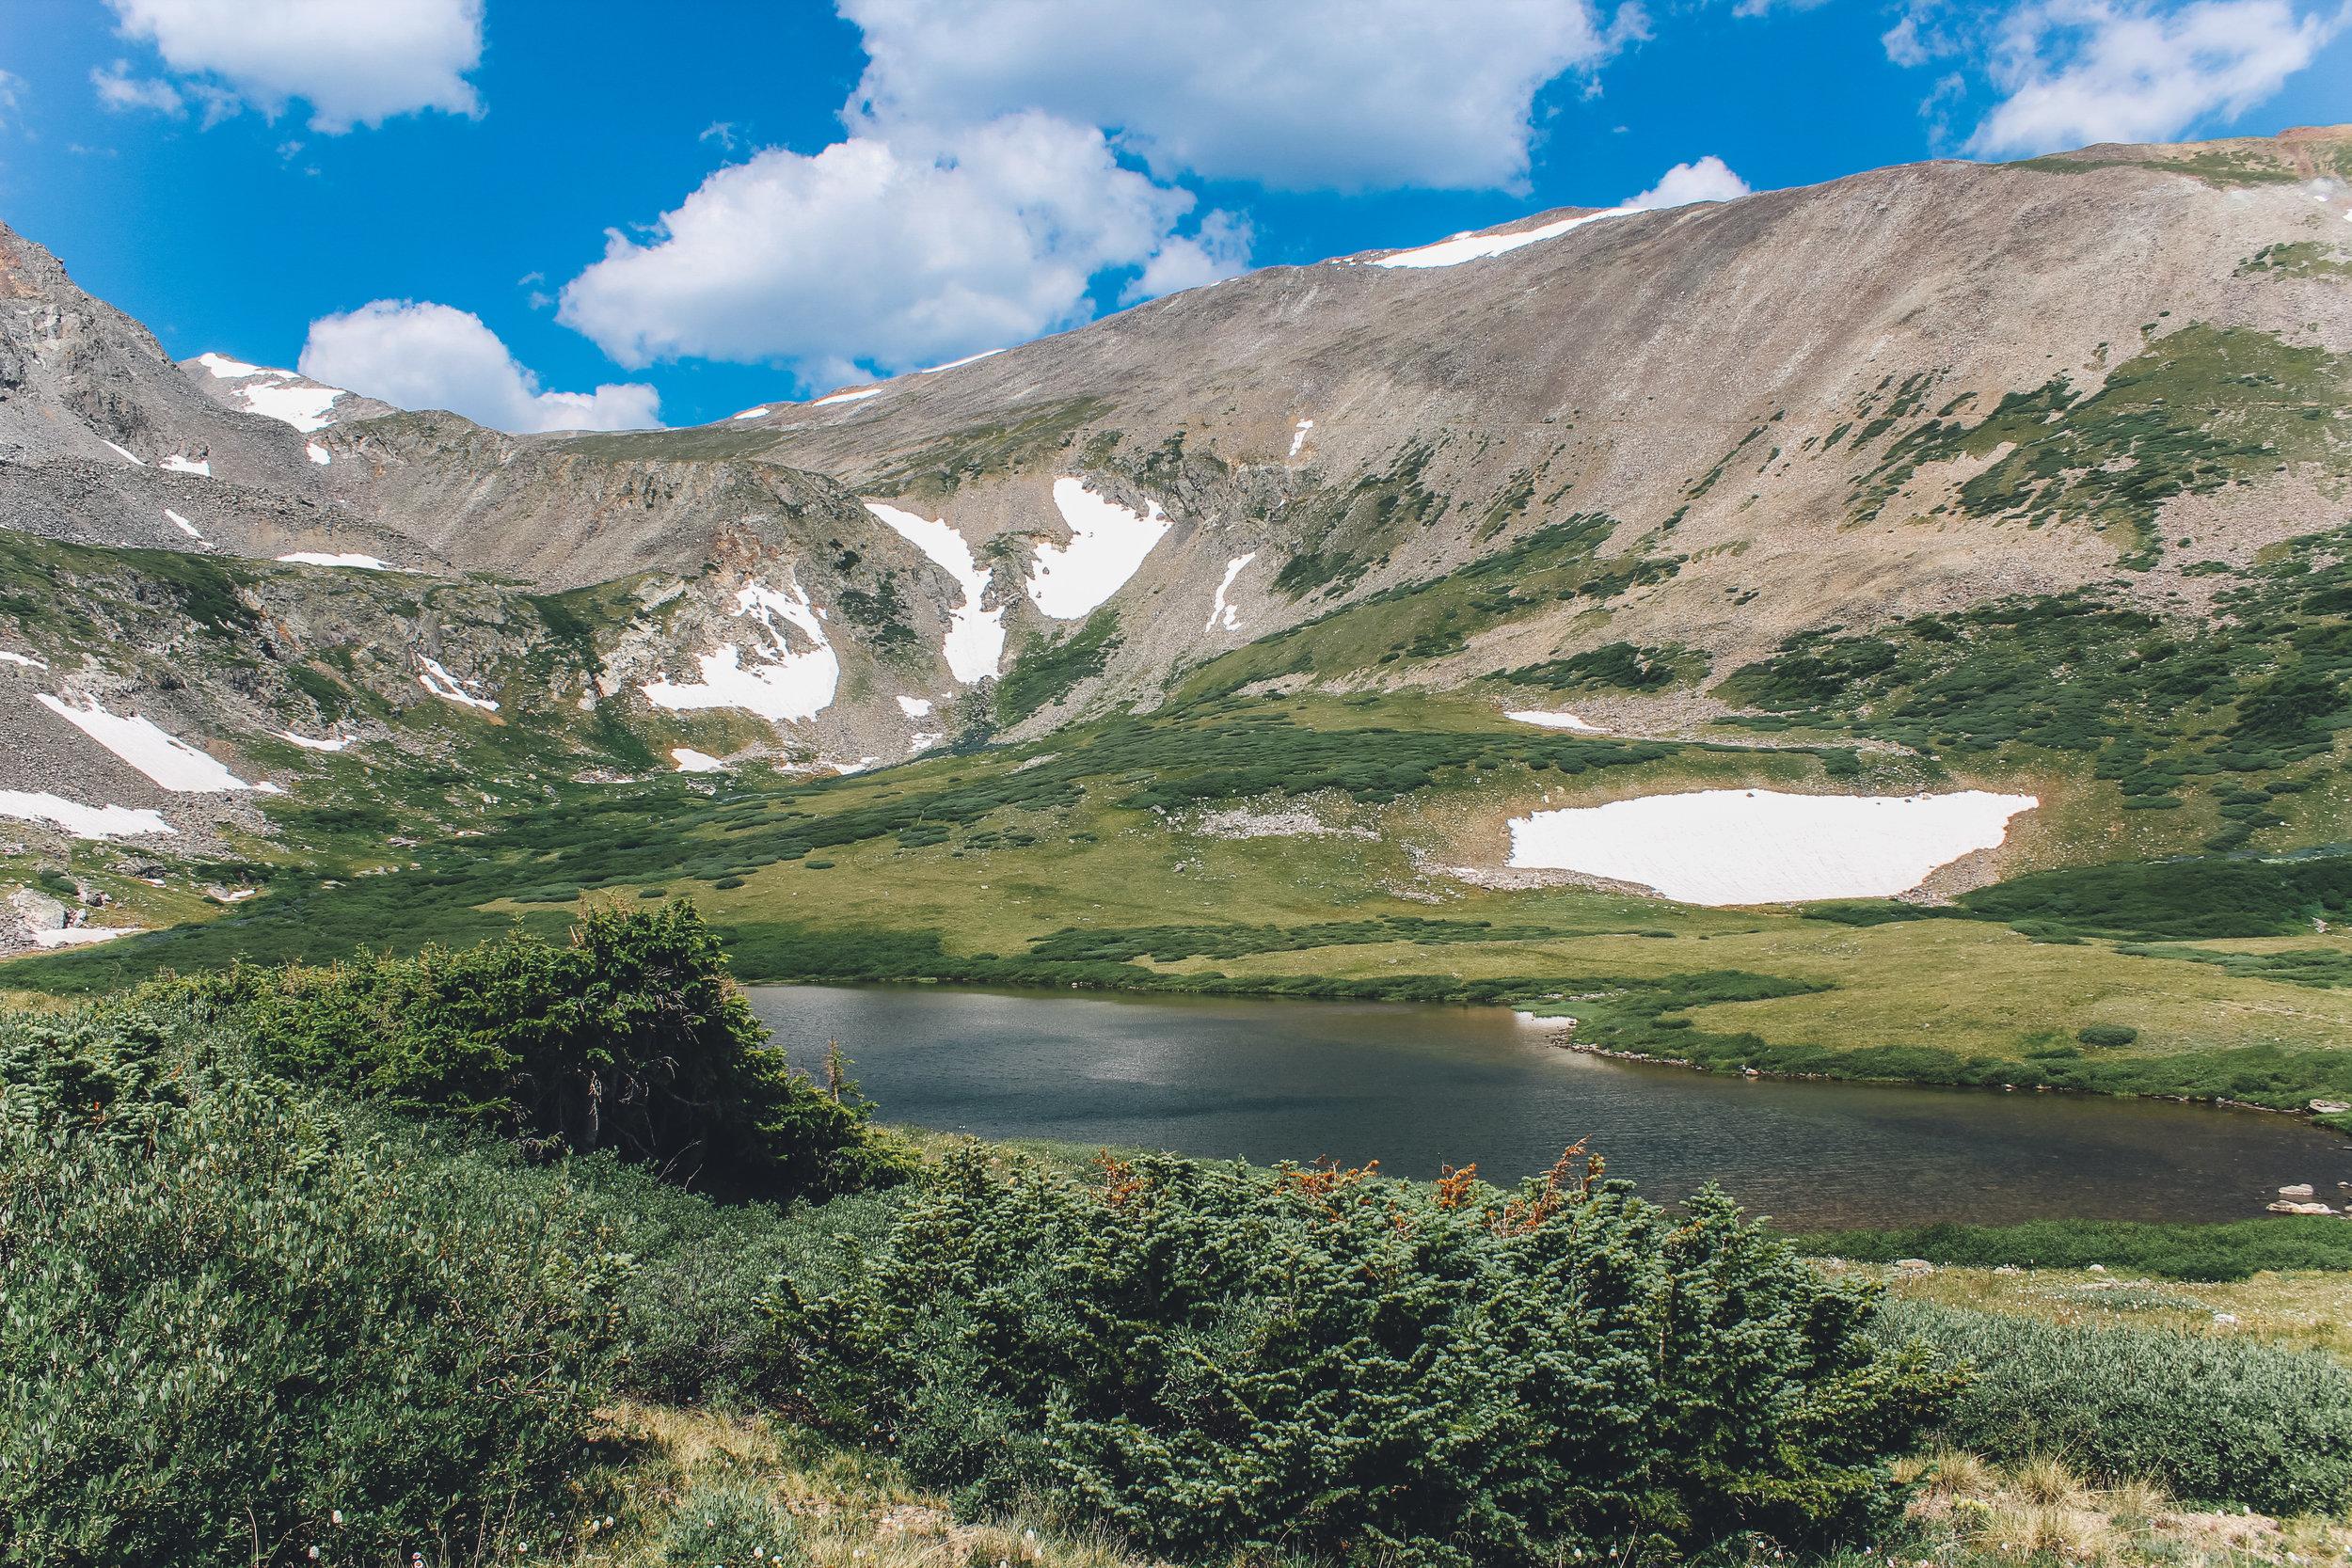 Mohawk Lake Trail - Breckenridge, COJuly 2016